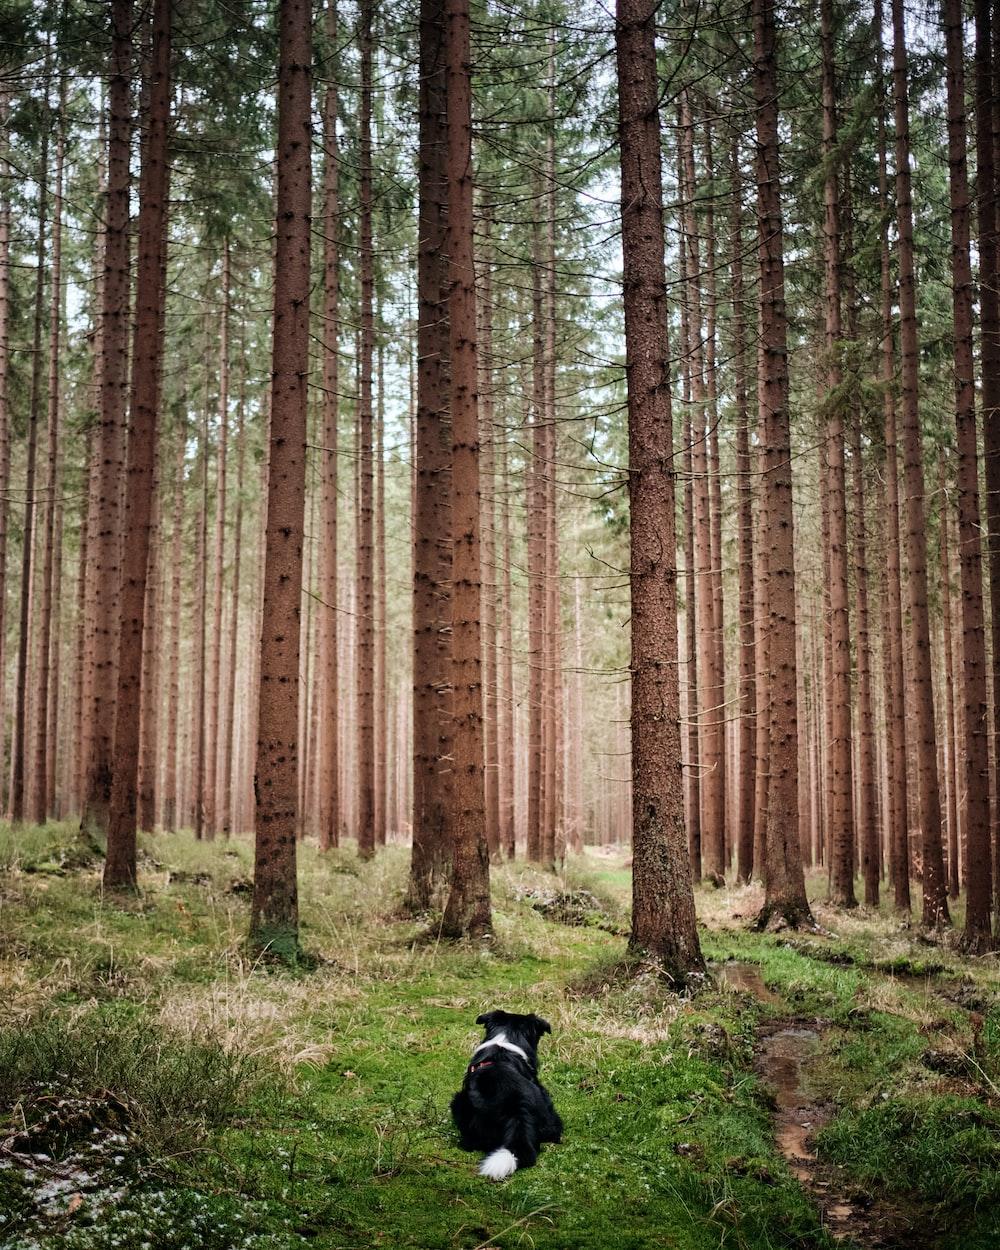 black labrador retriever on green grass field near brown trees during daytime